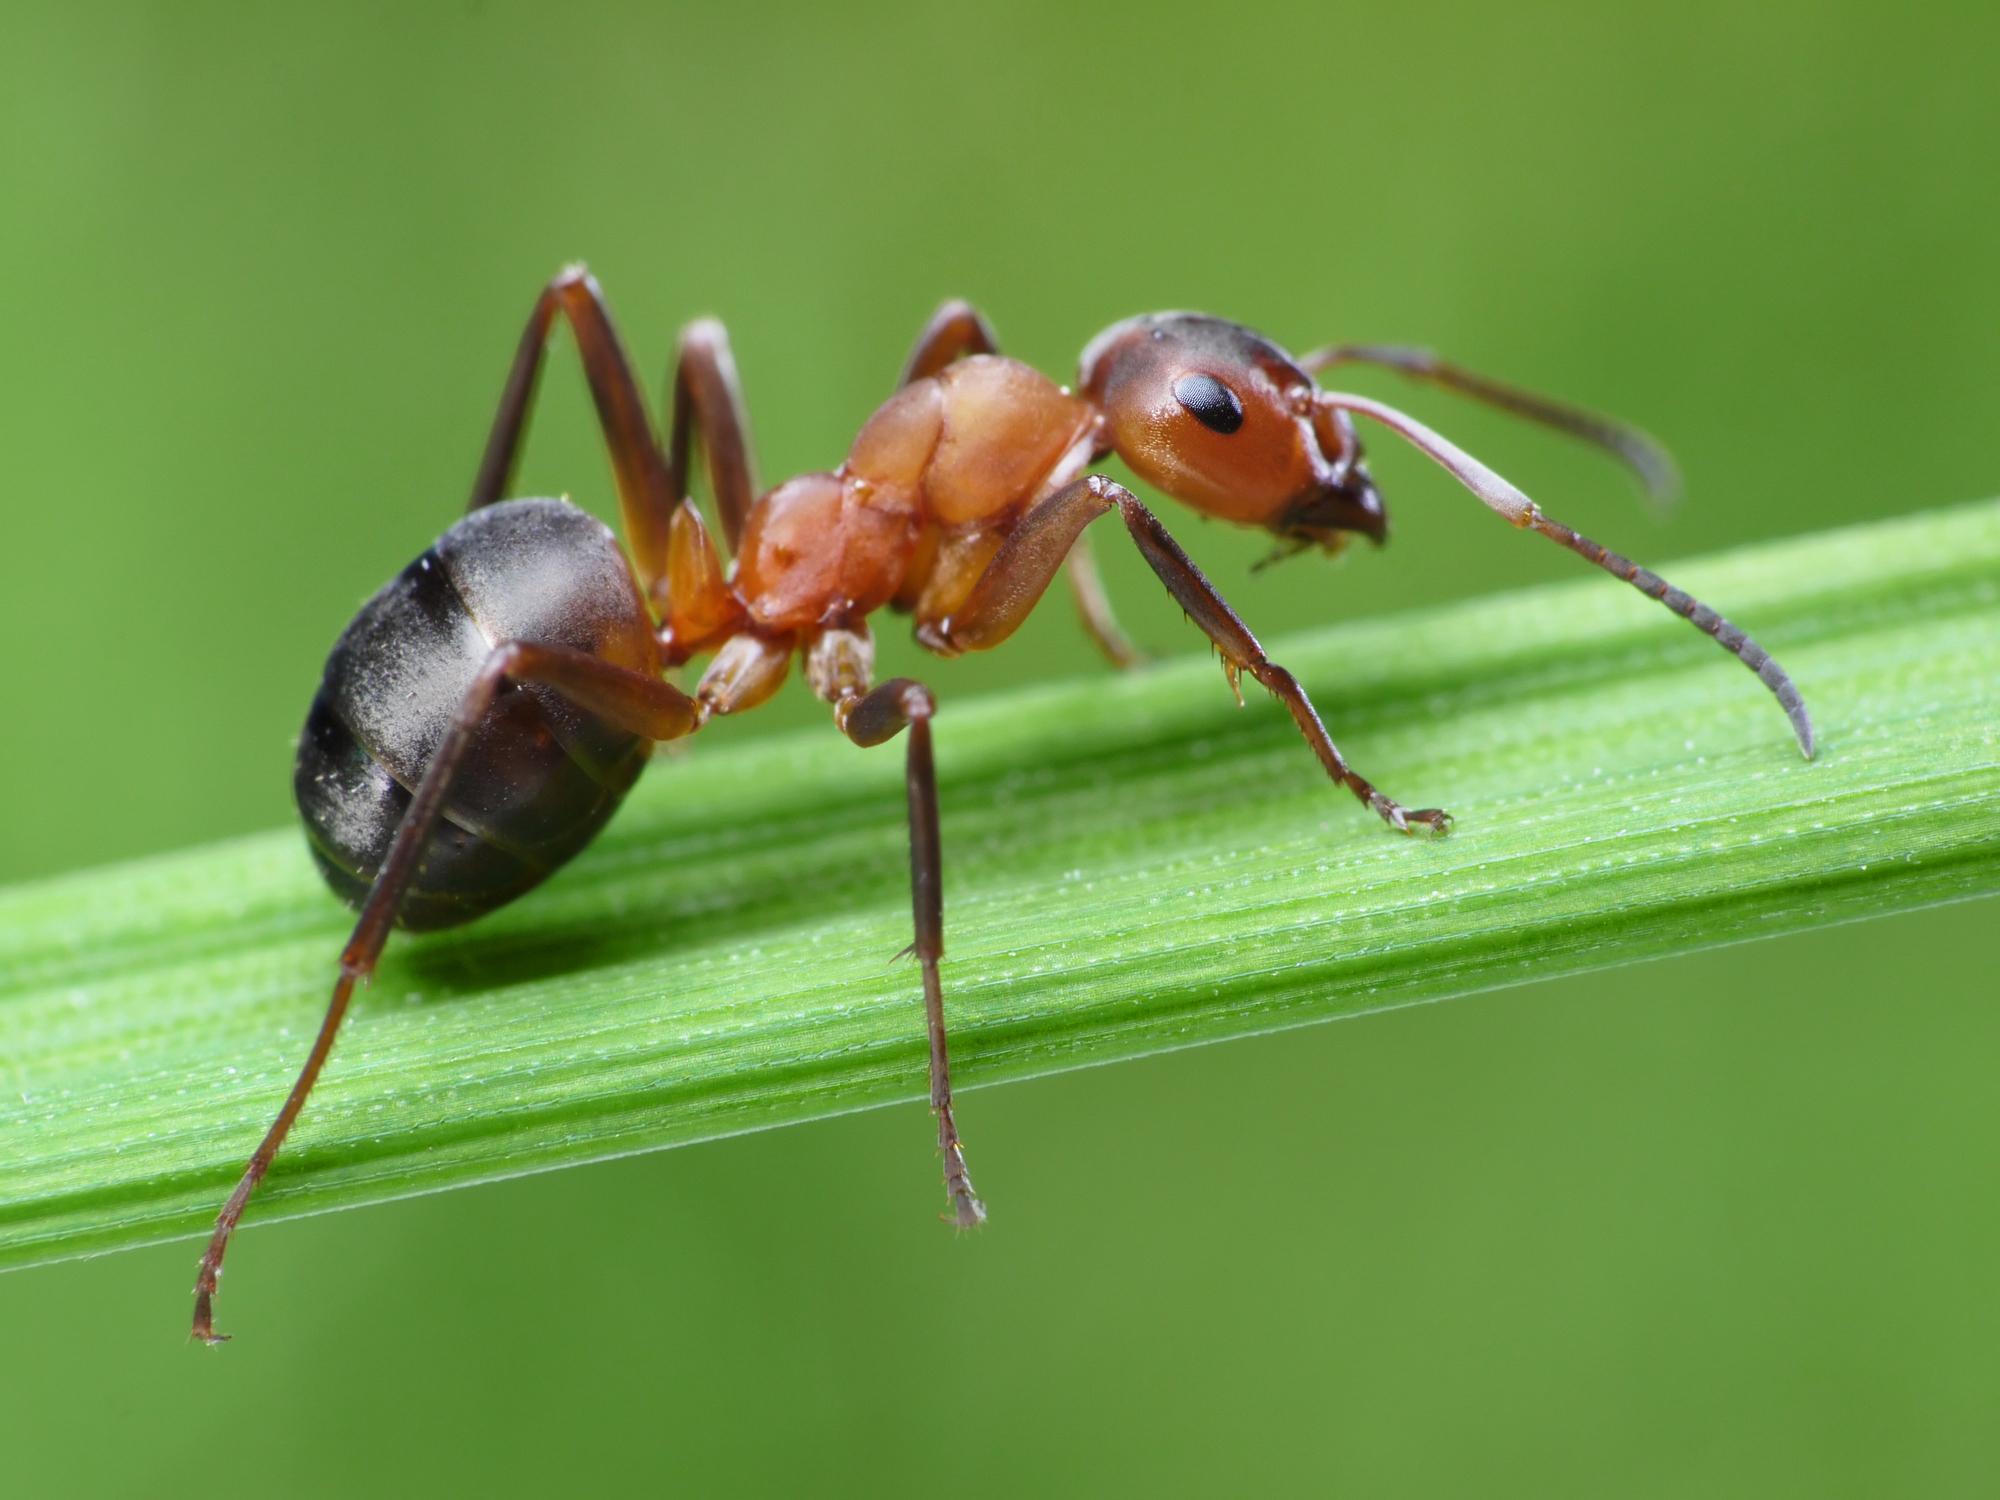 Extermination de fourmis de pavé